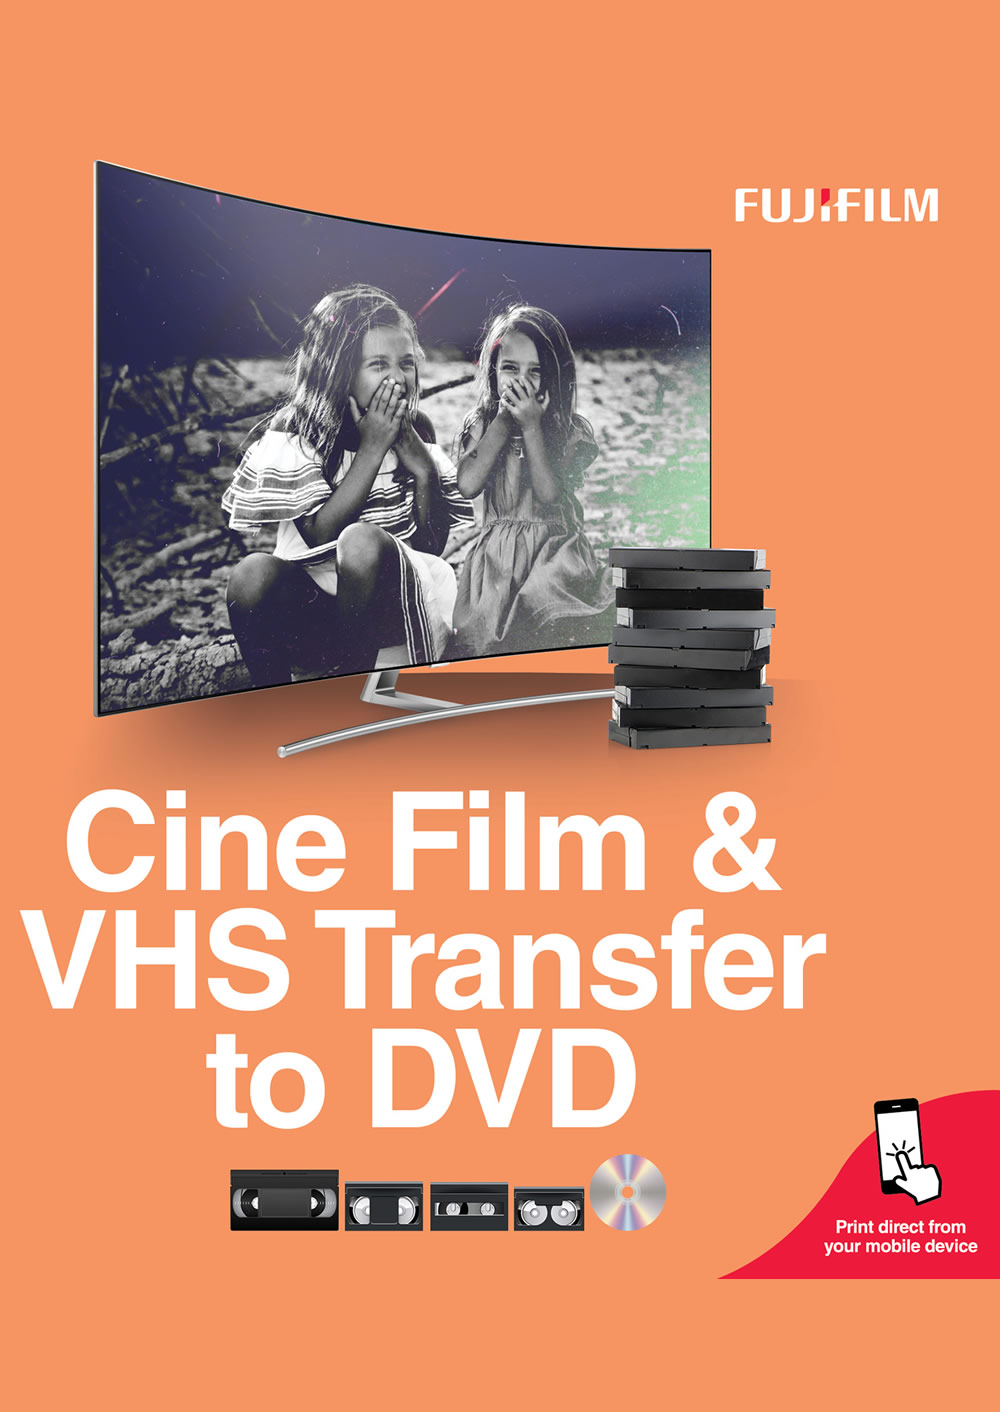 Fujifilm VHS & DVD